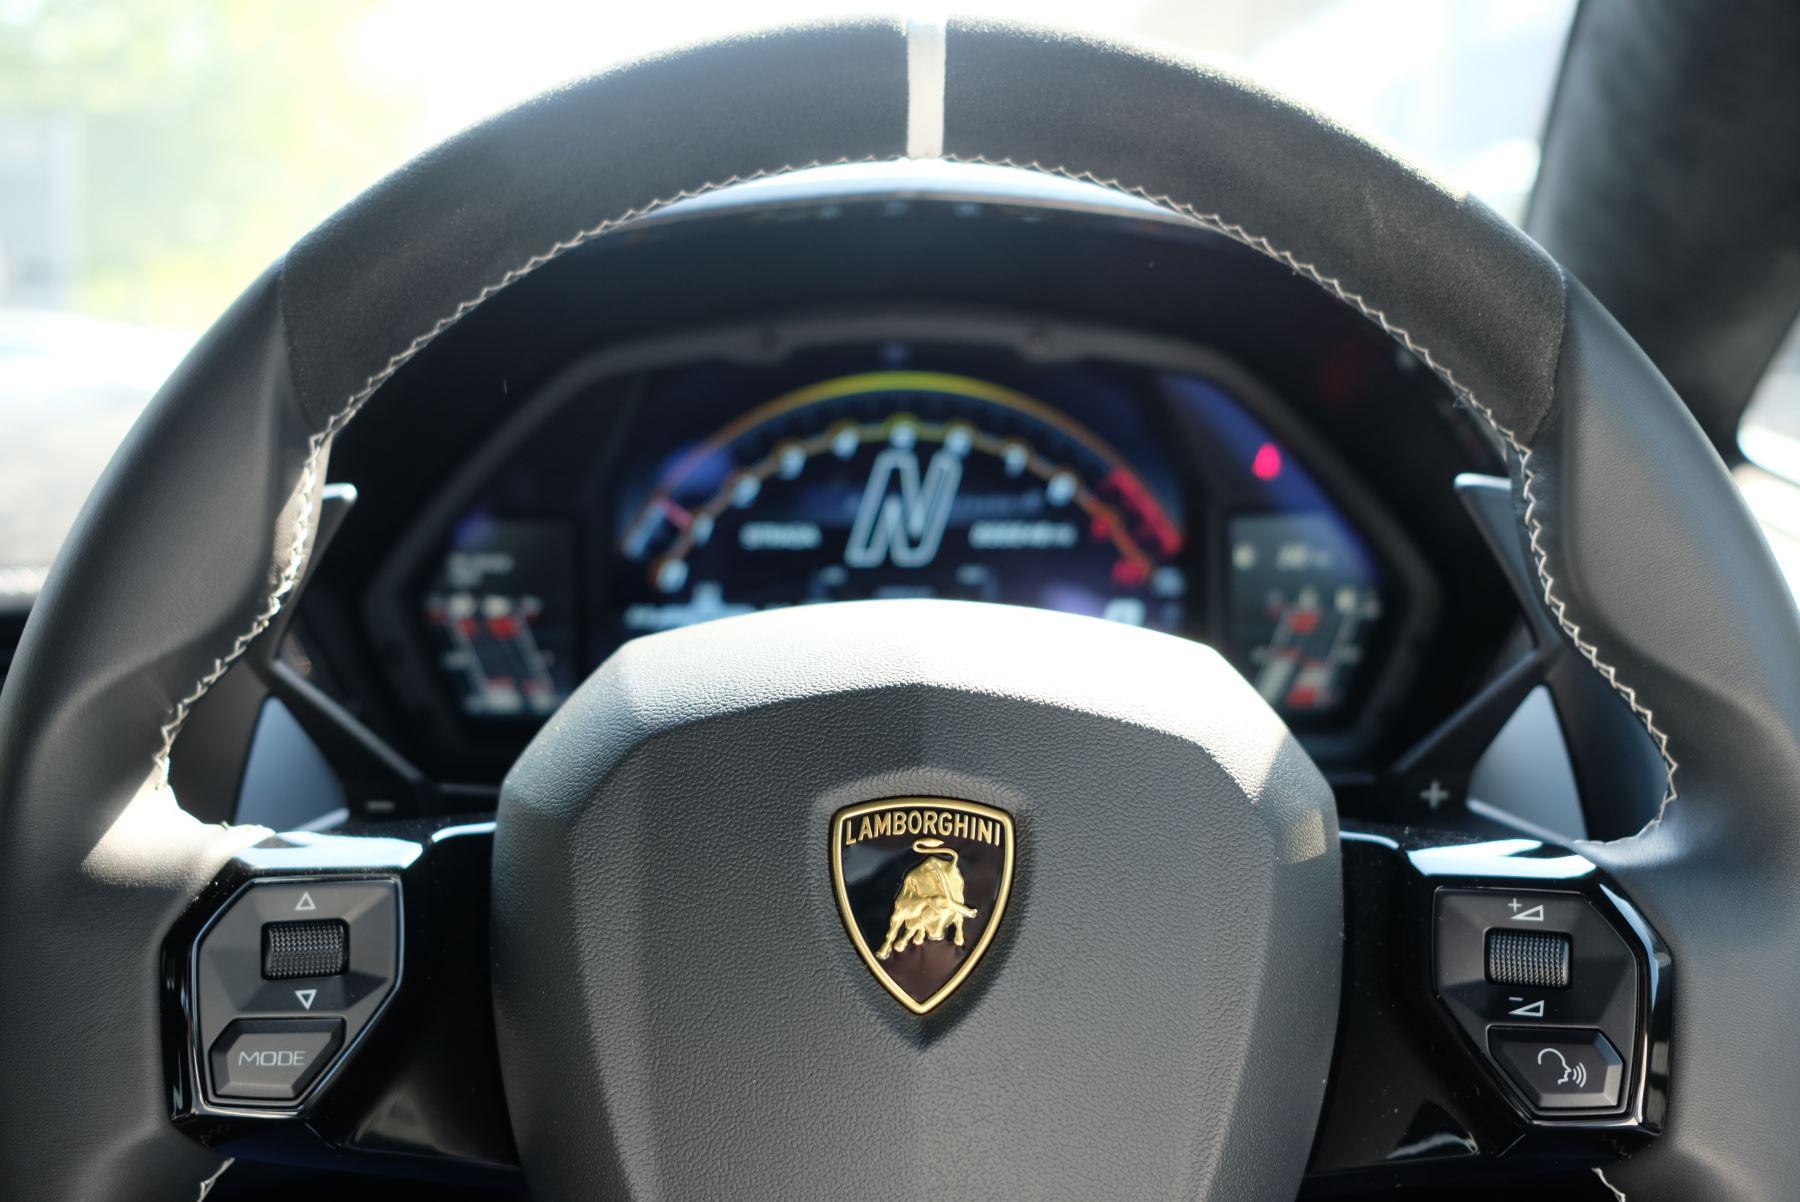 Lamborghini Aventador SVJ Coupe VAT Qualifying image 11